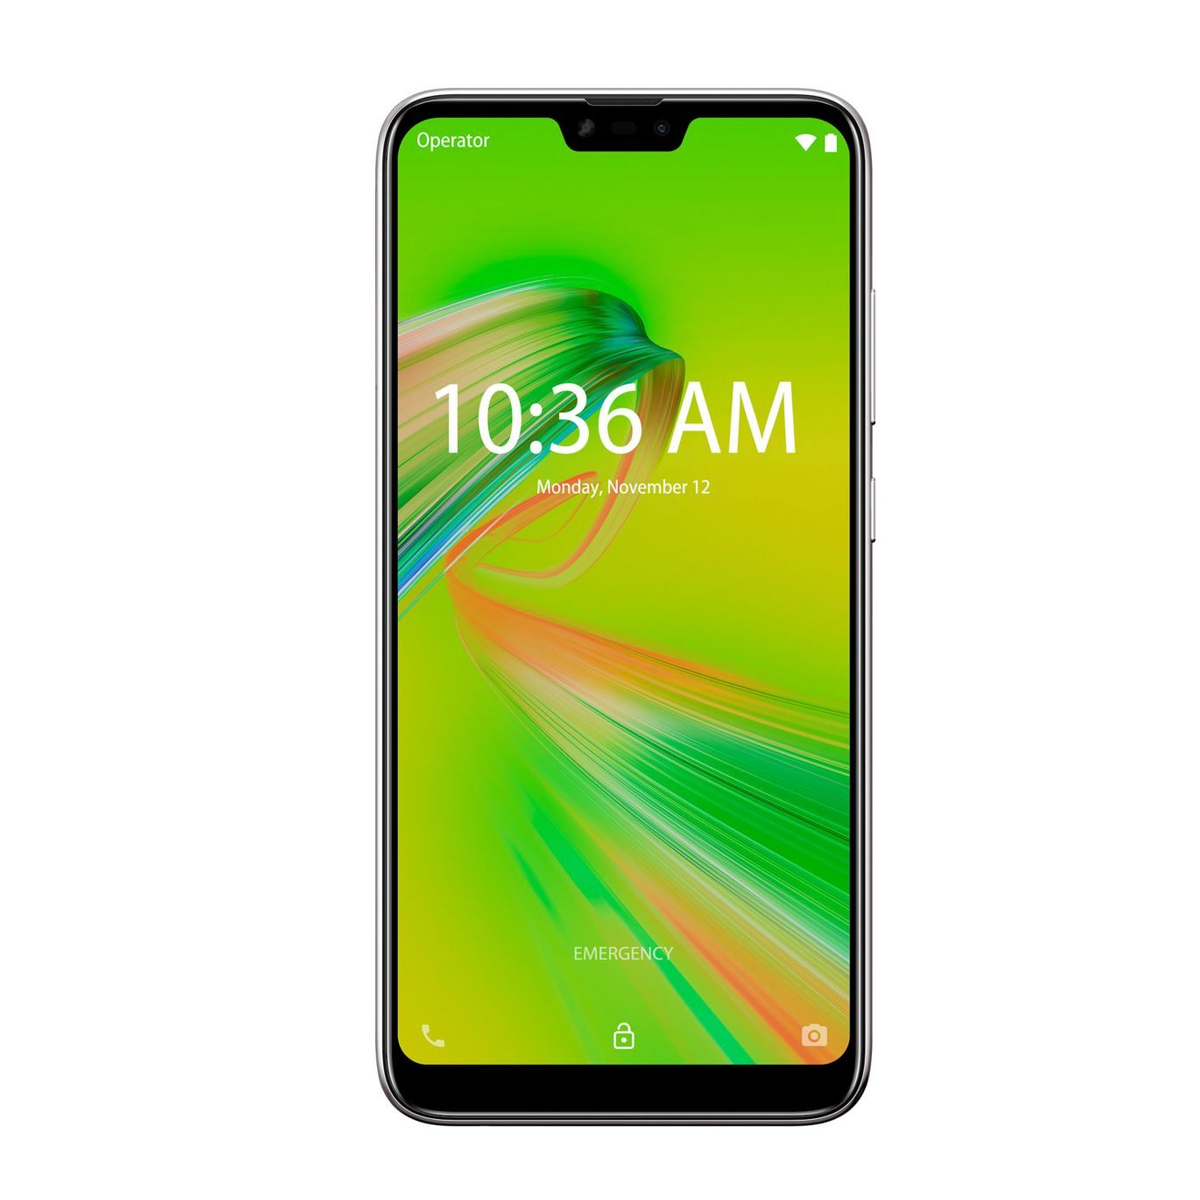 "Smartphone Asus Zenfone Max Shot Prata 32GB 6.2"" Android 8.0 Oreo ZB634KL"